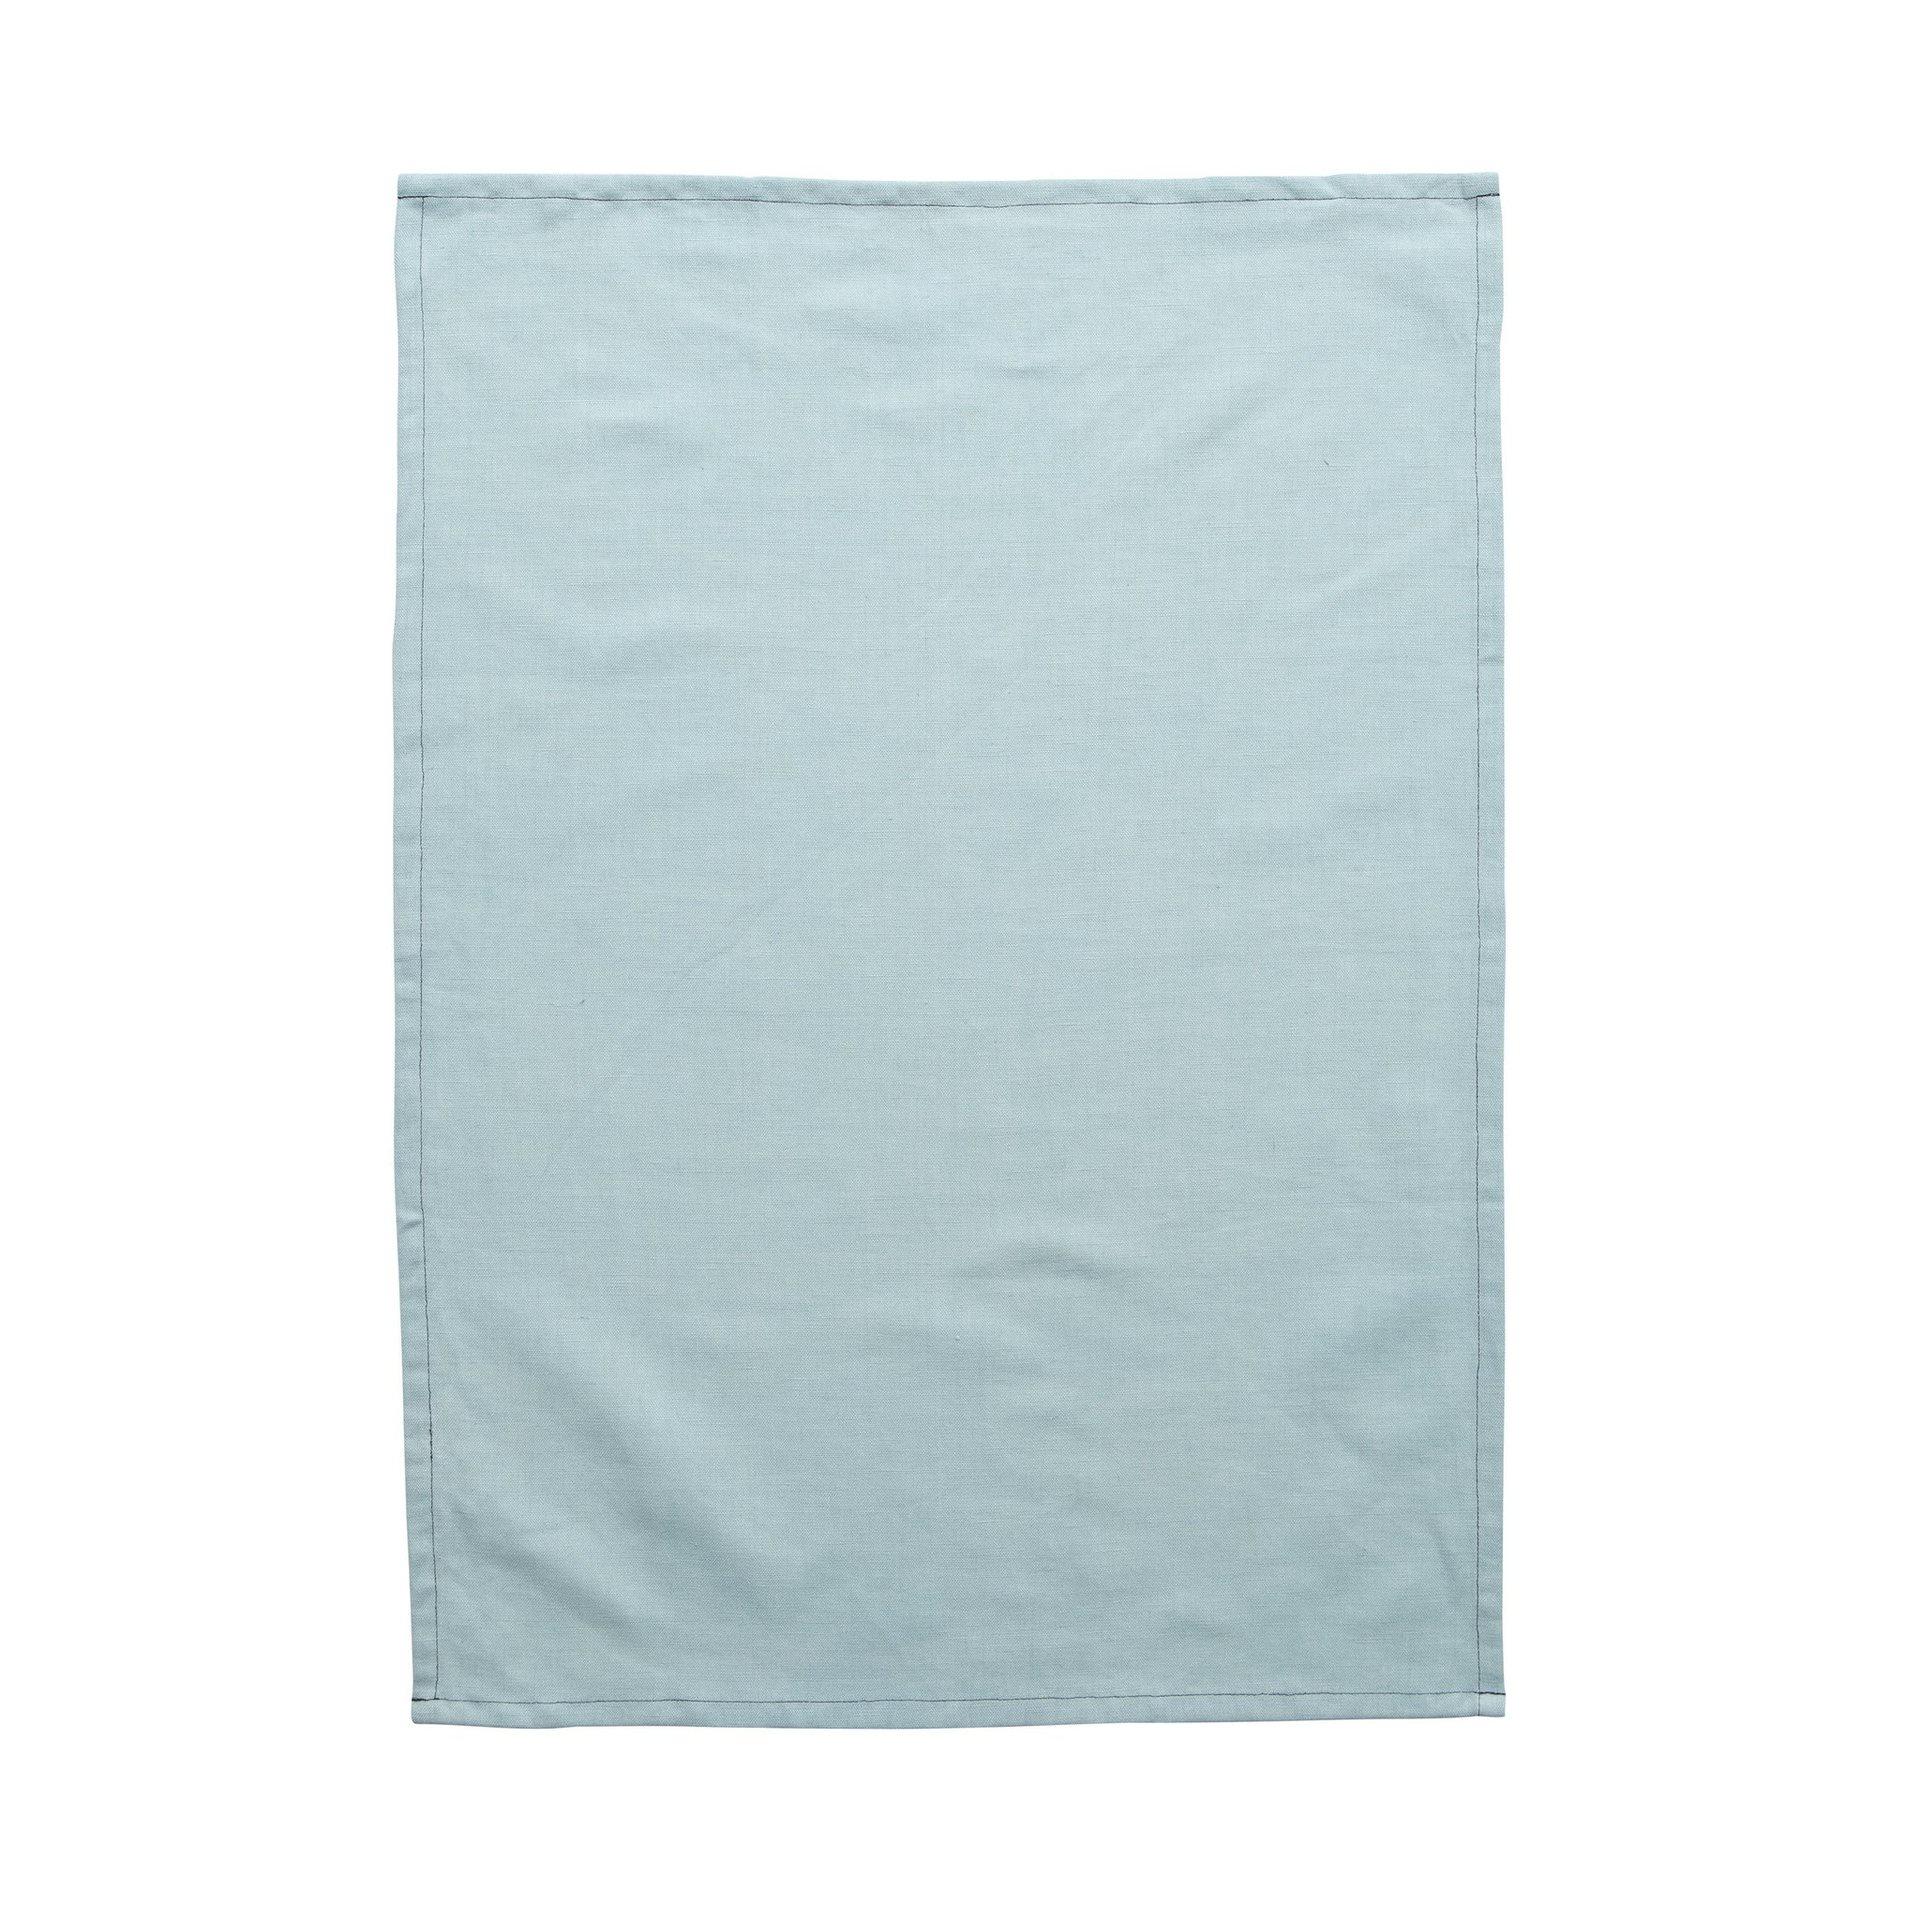 Milk & Sugar Seafoam Linen Tea Towel